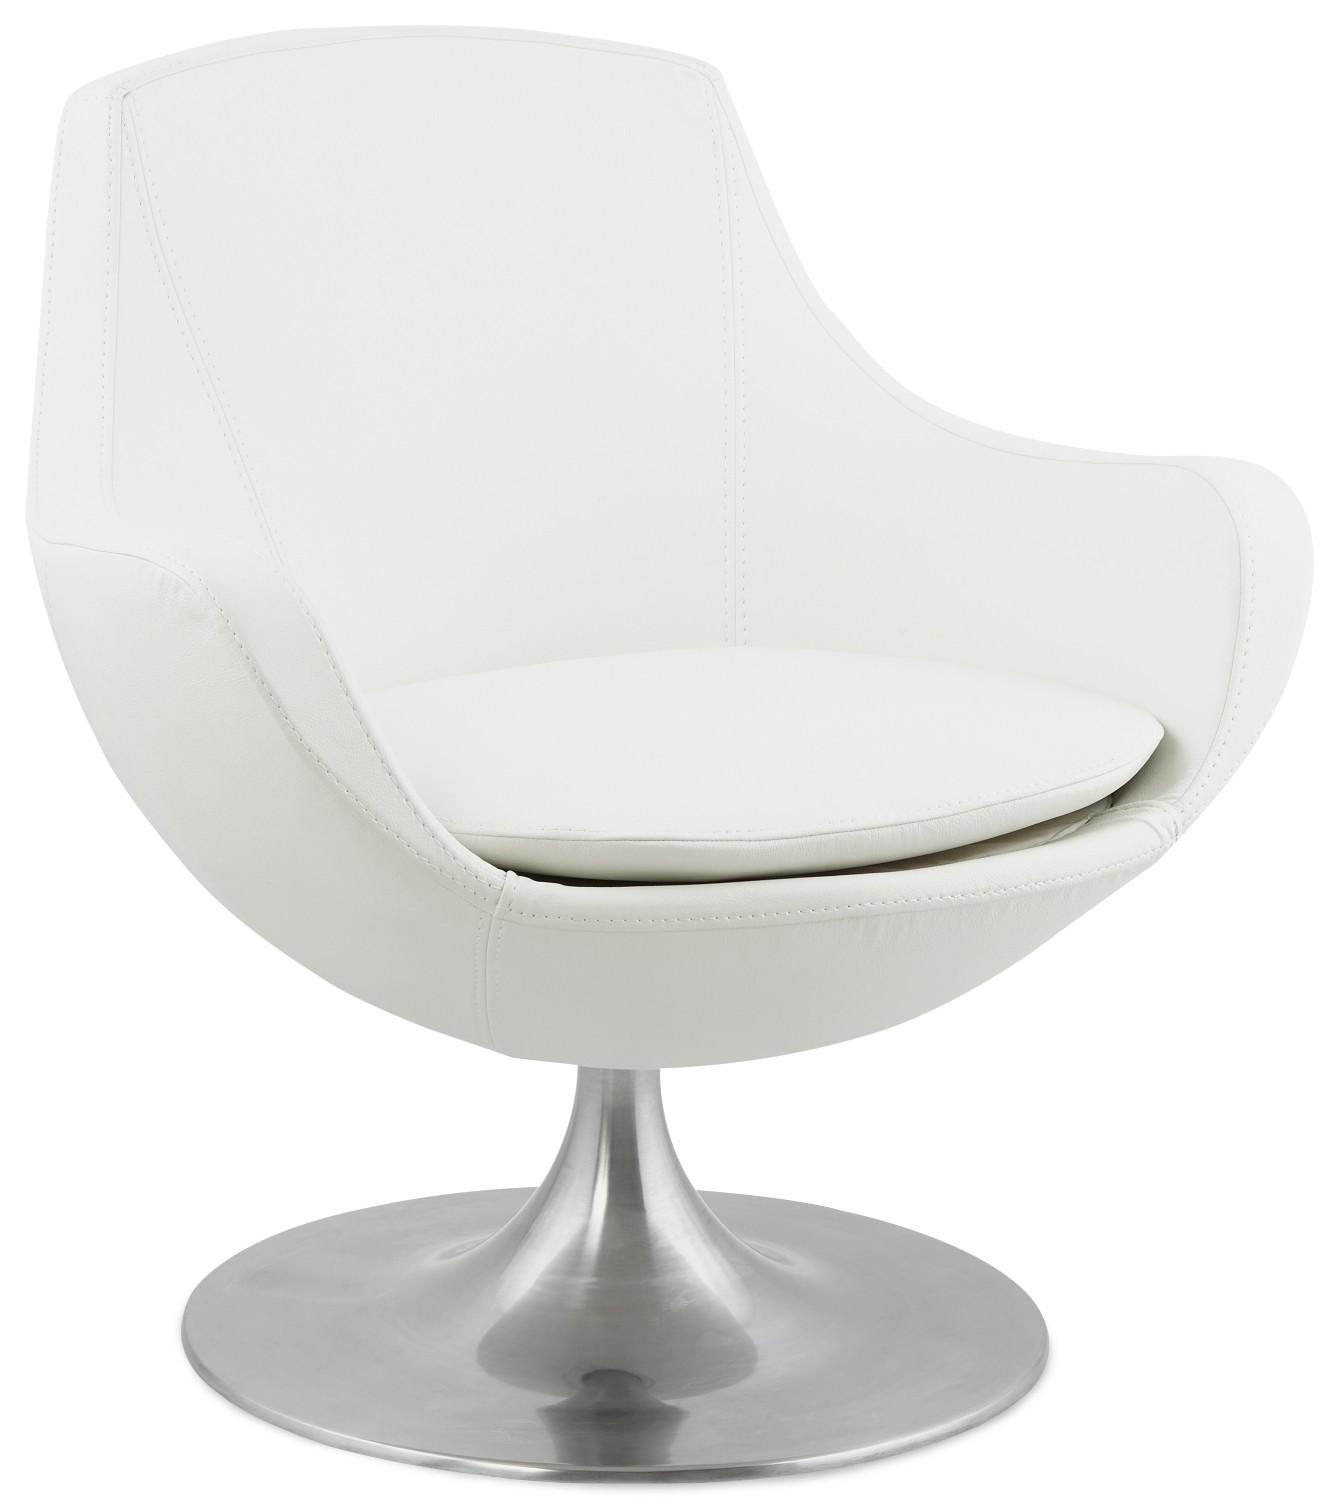 24Designs Draaibare Fauteuil Stephano - Aluminium Voet - Wit Kunstleer